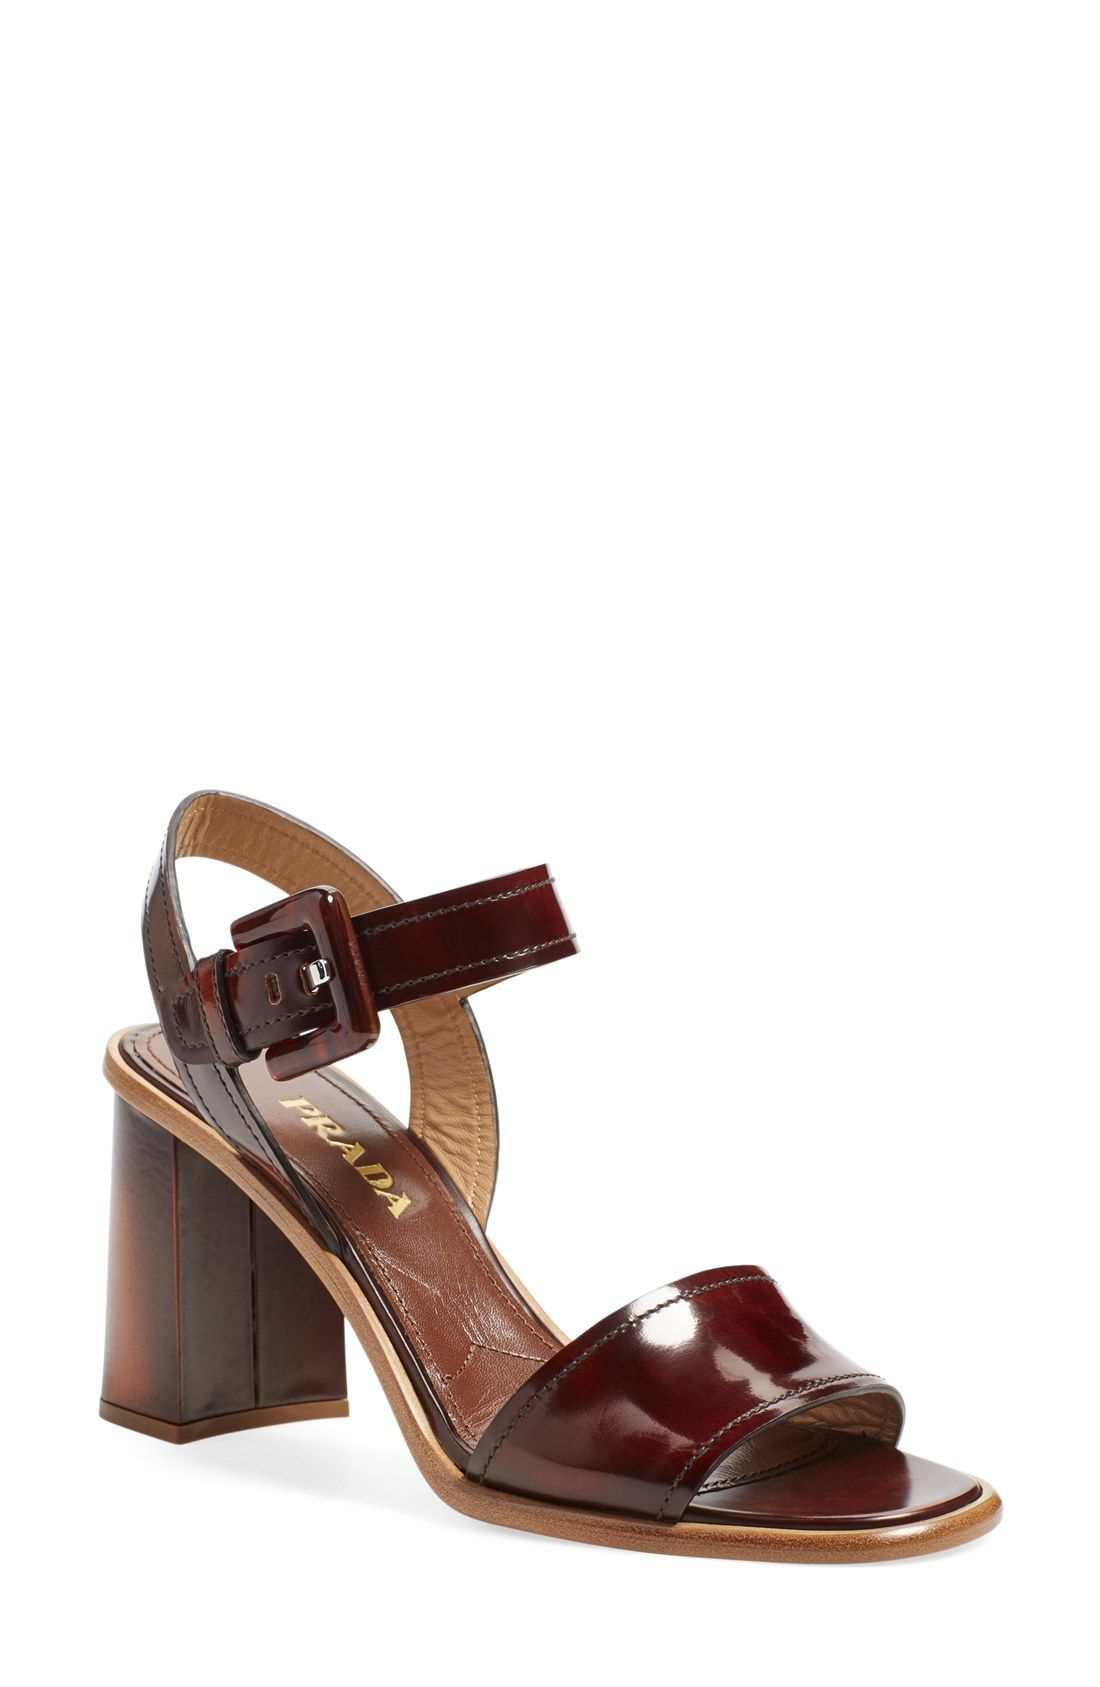 2f40398dff56 Prada  Donna  Ankle Strap Sandal (Women)